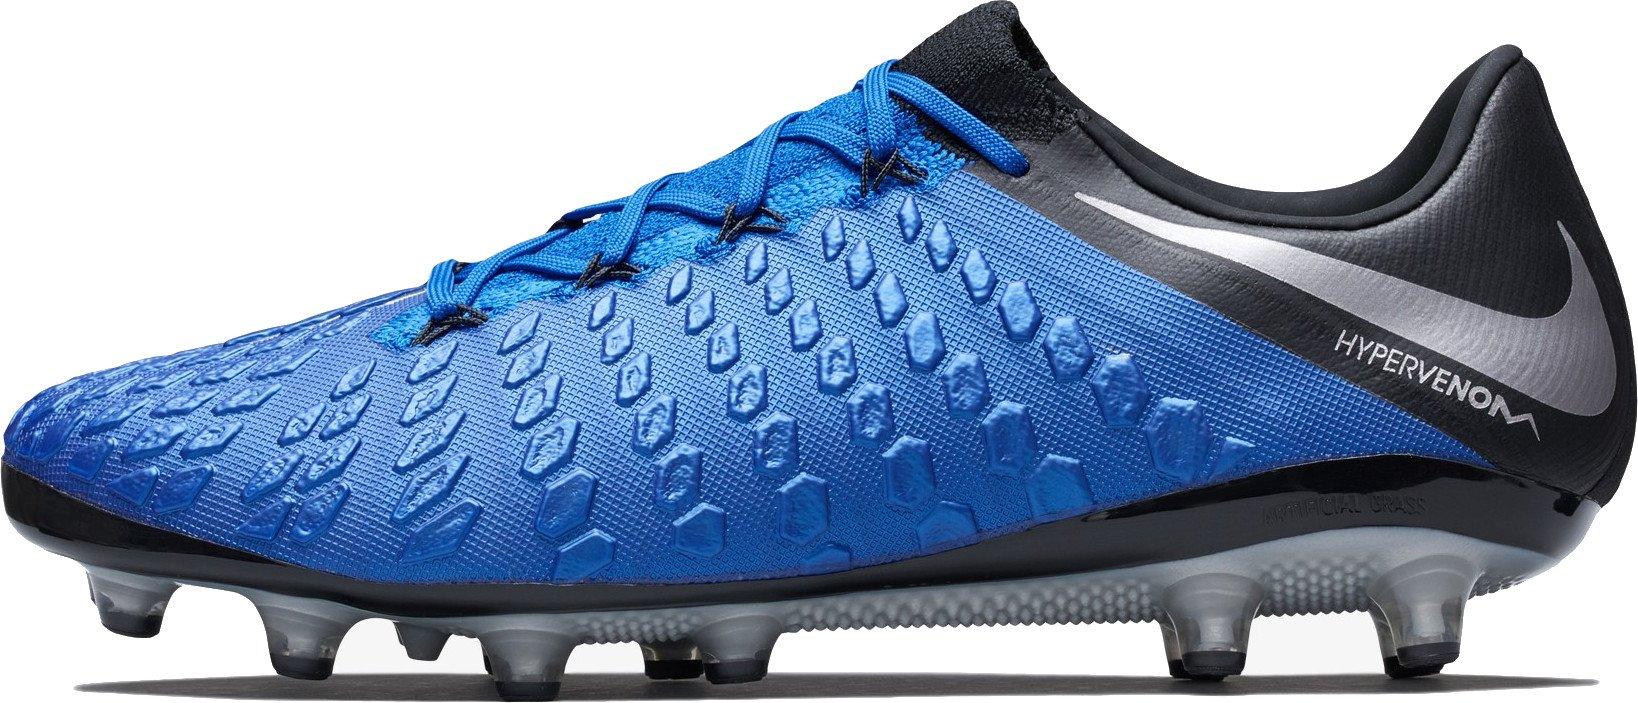 the best attitude 55b9e 80114 Football shoes Nike HYPERVENOM 3 ELITE AG-PRO